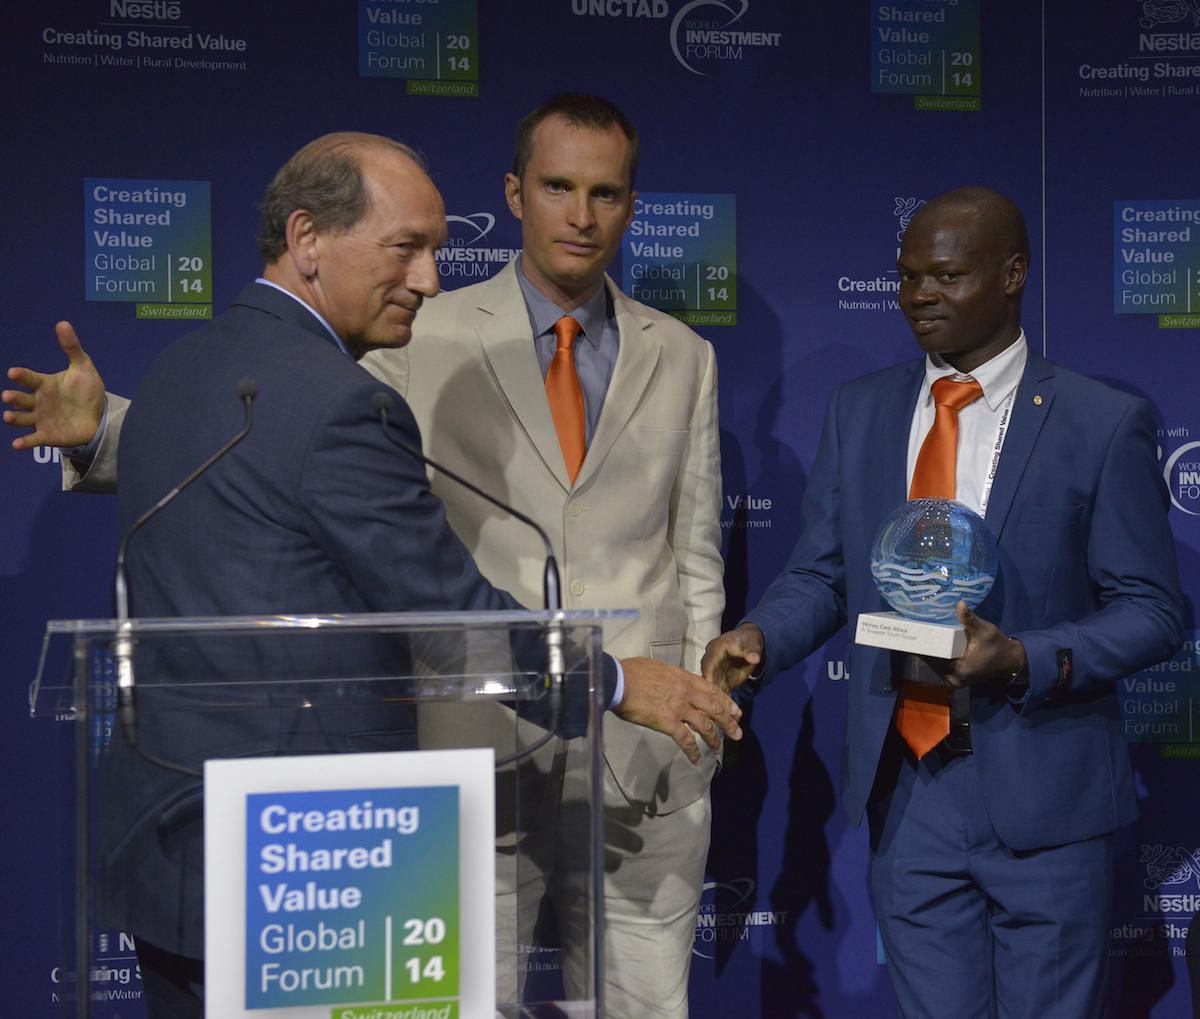 Honeycare Nestlé Creating Shared Value Prize